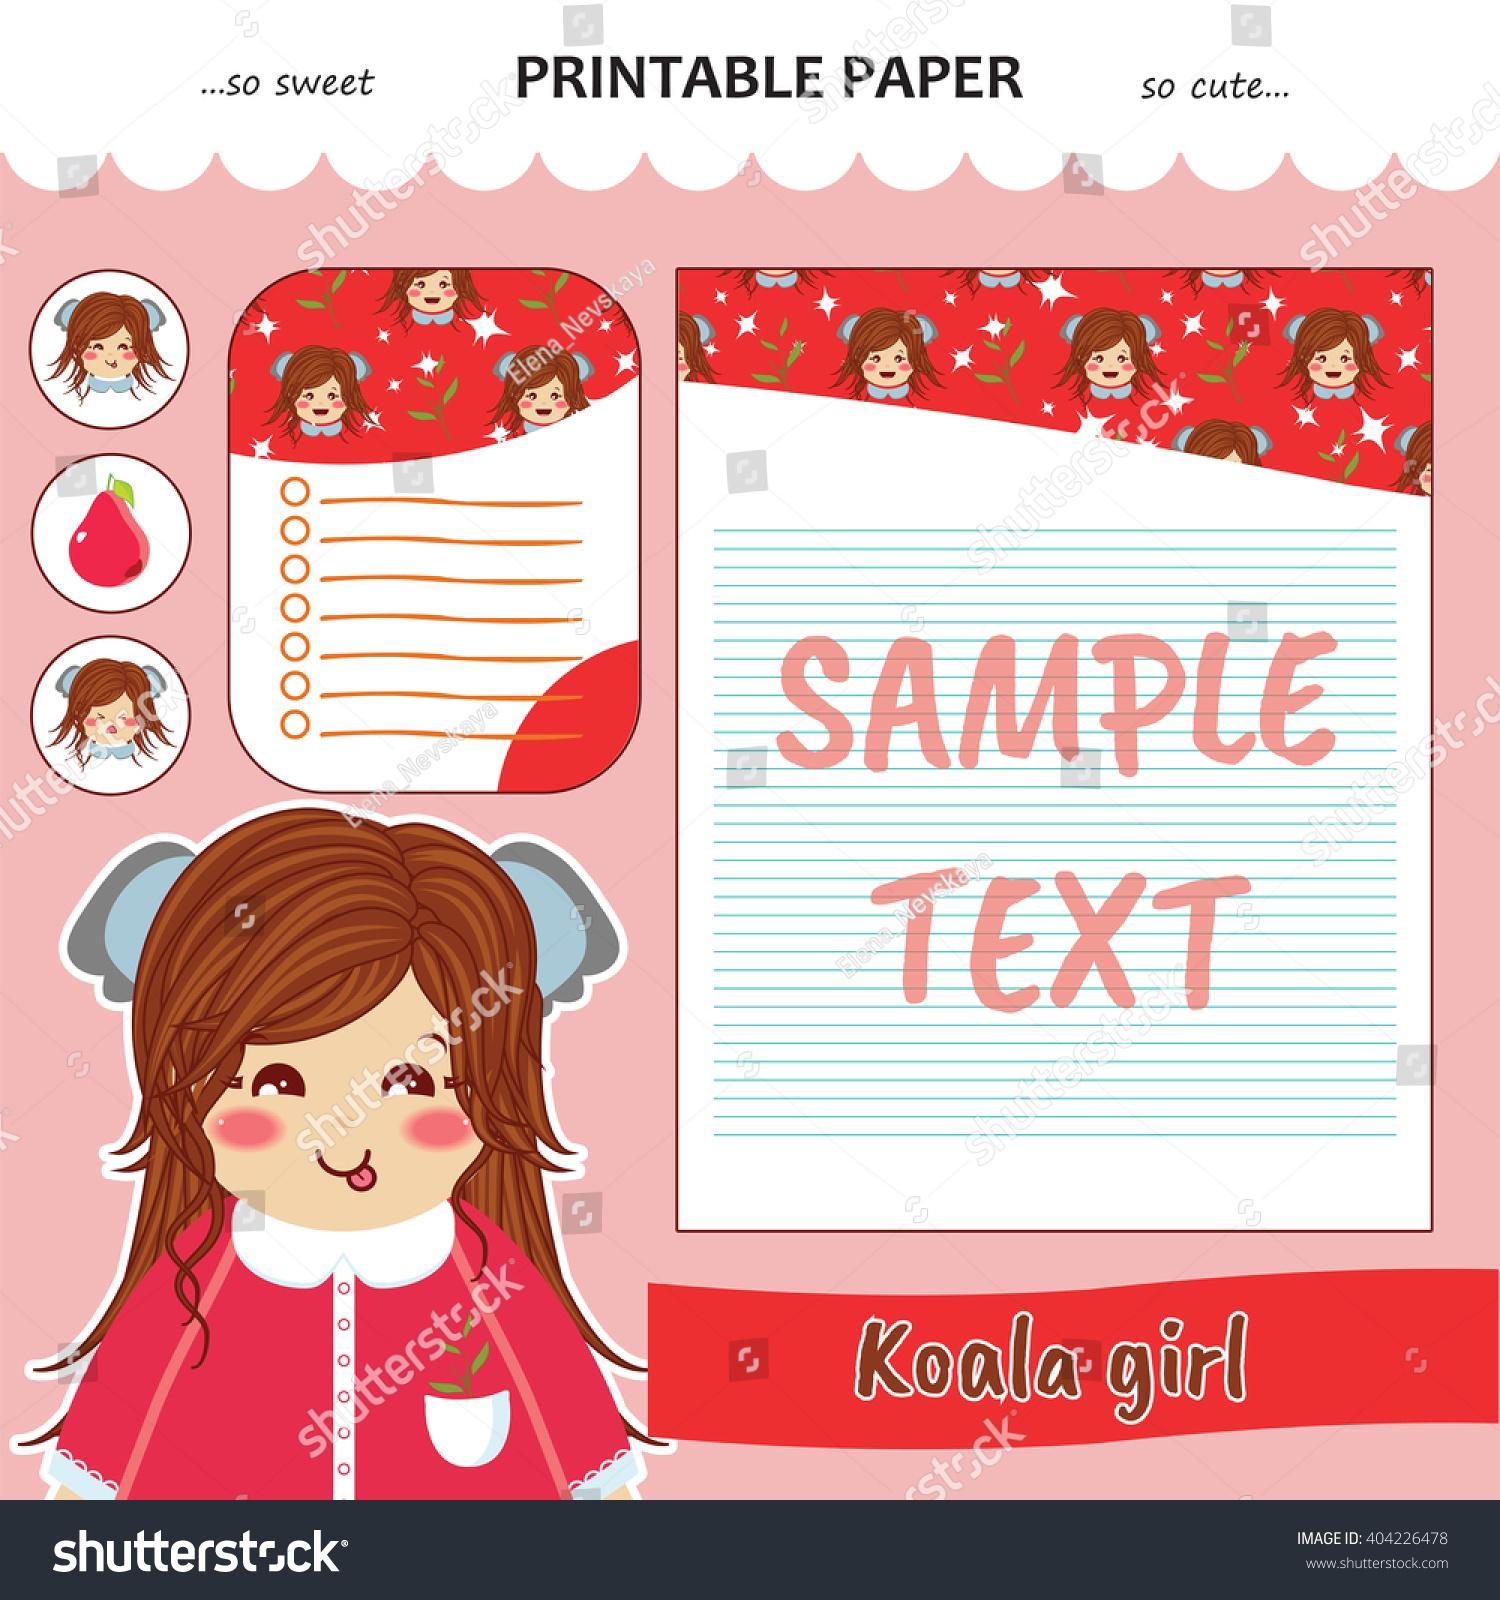 Kawaii Cute Set Vector Printable Paper Stock Vector (Royalty Free ...